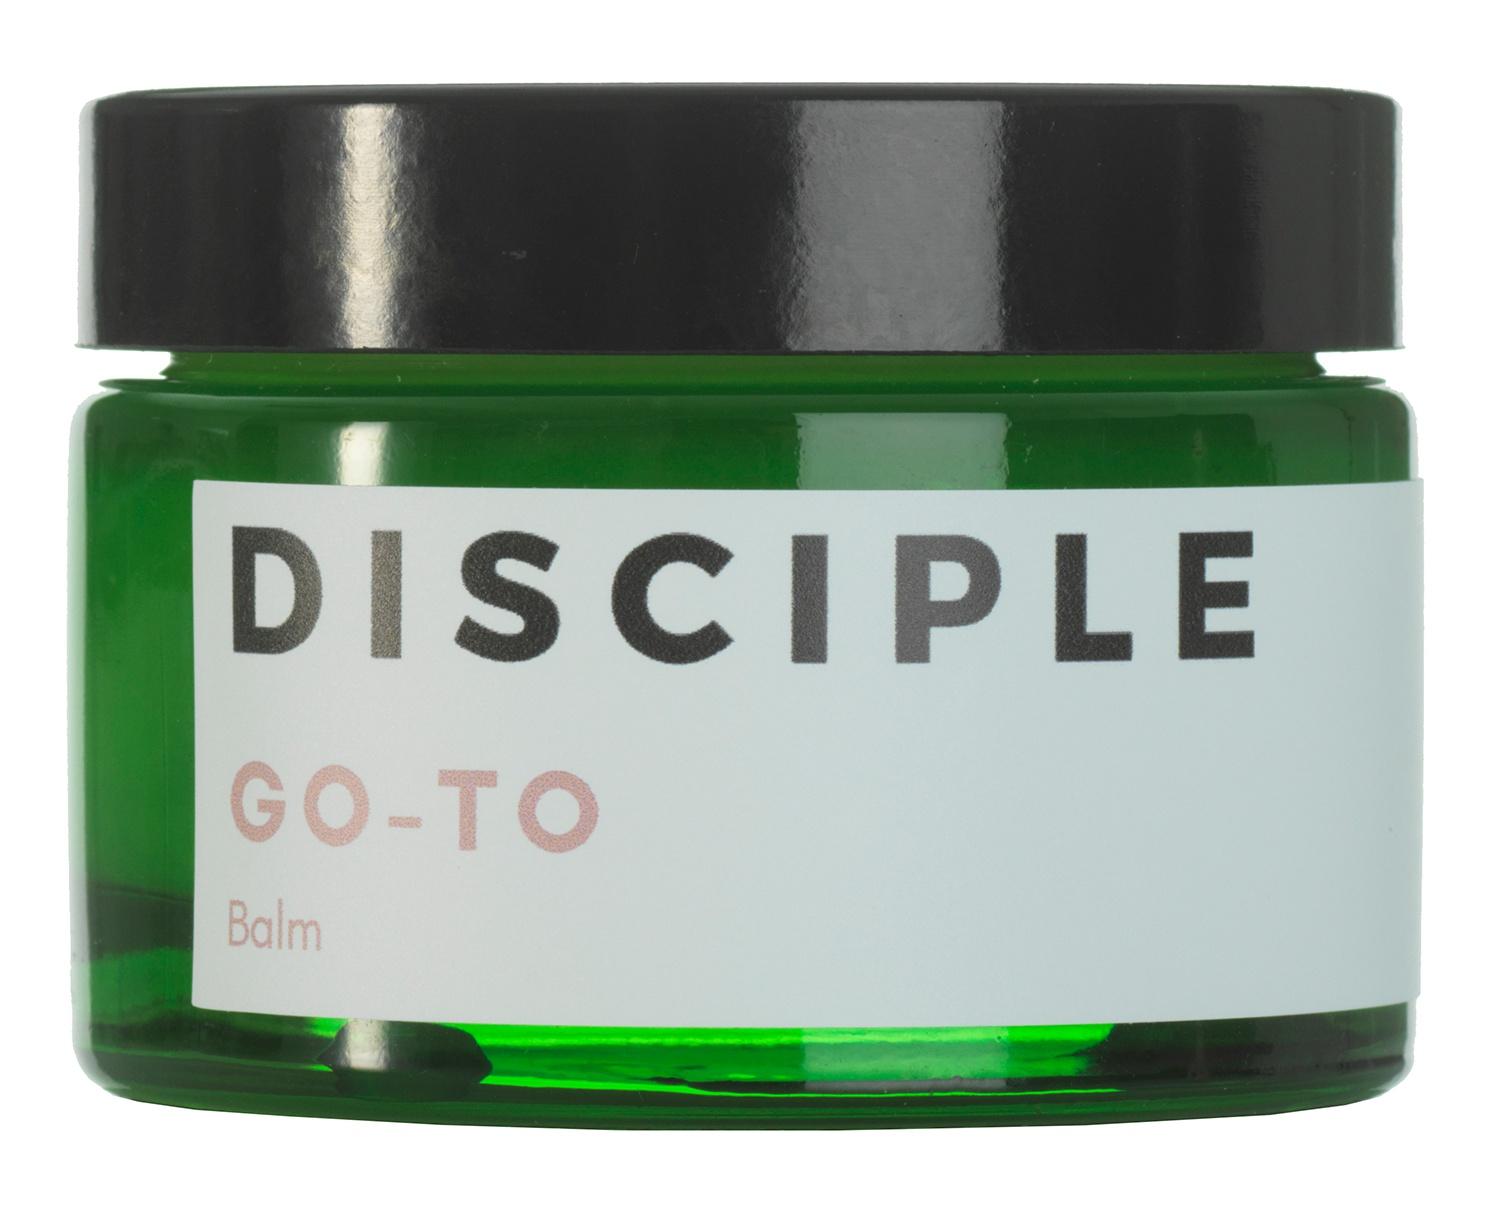 Disciple Skincare Go-To-Balm